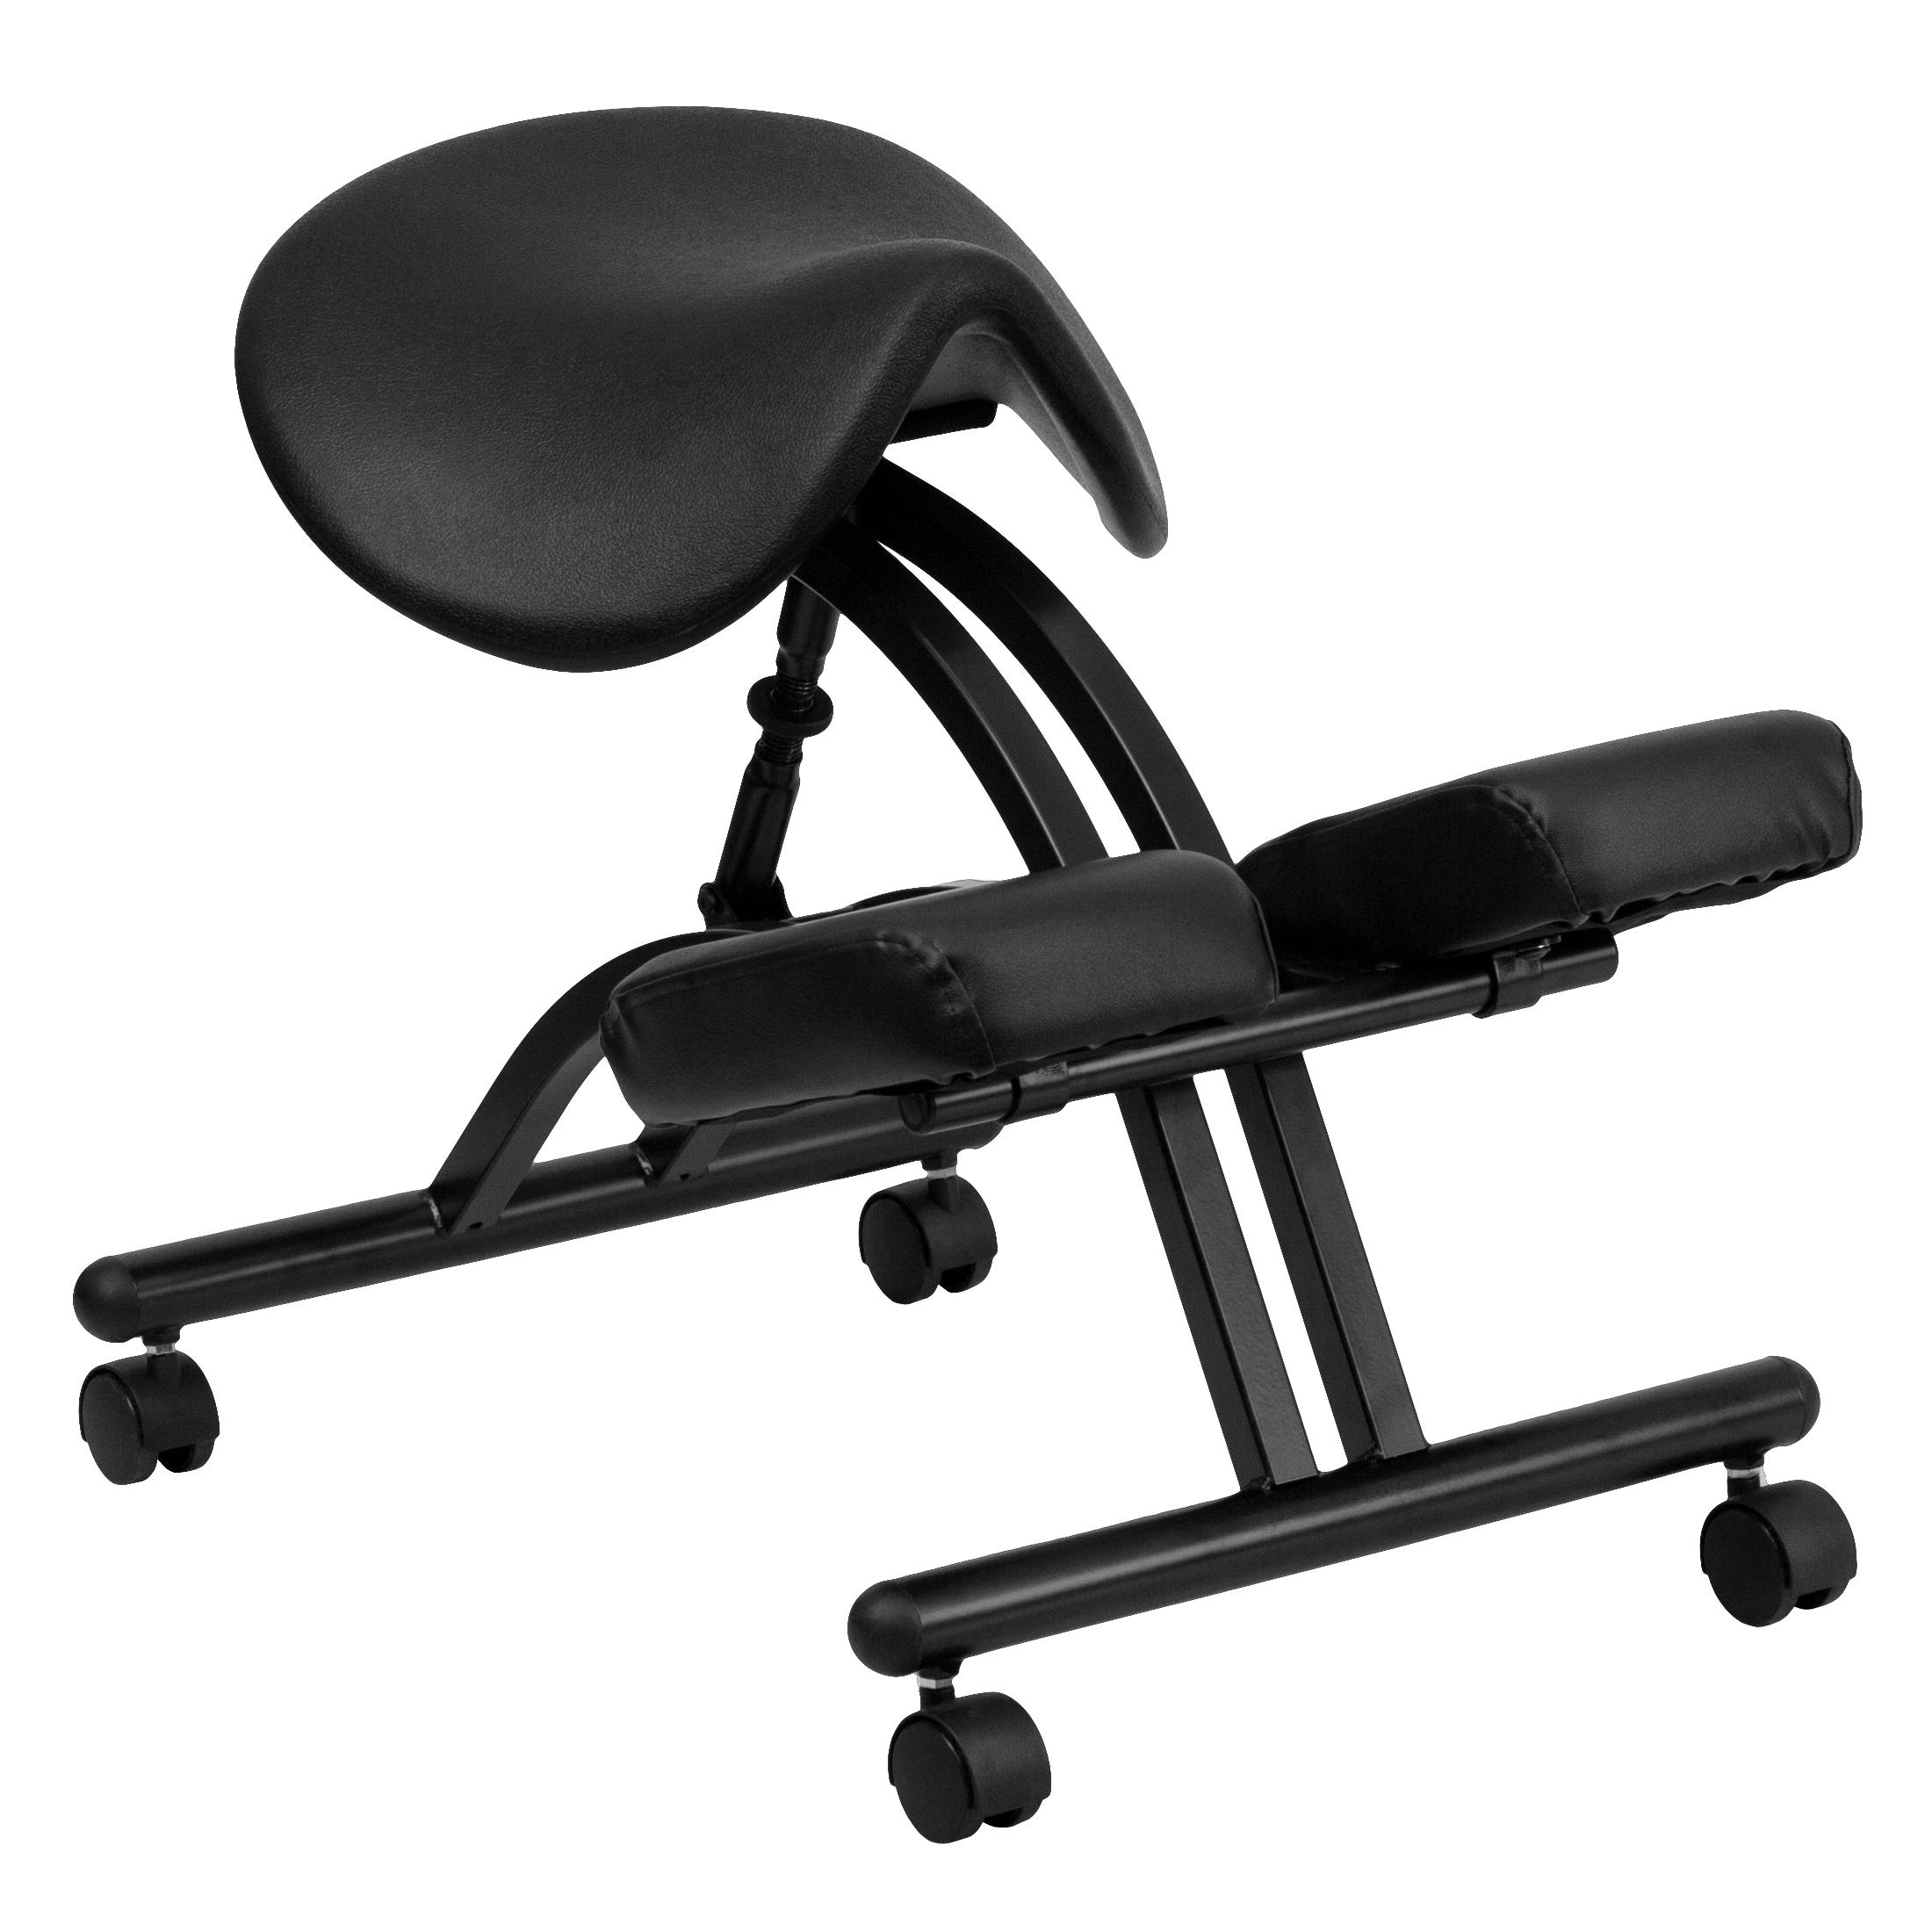 ergonomic chair knee rest target grey dorm flash kneeling with black saddle seat by